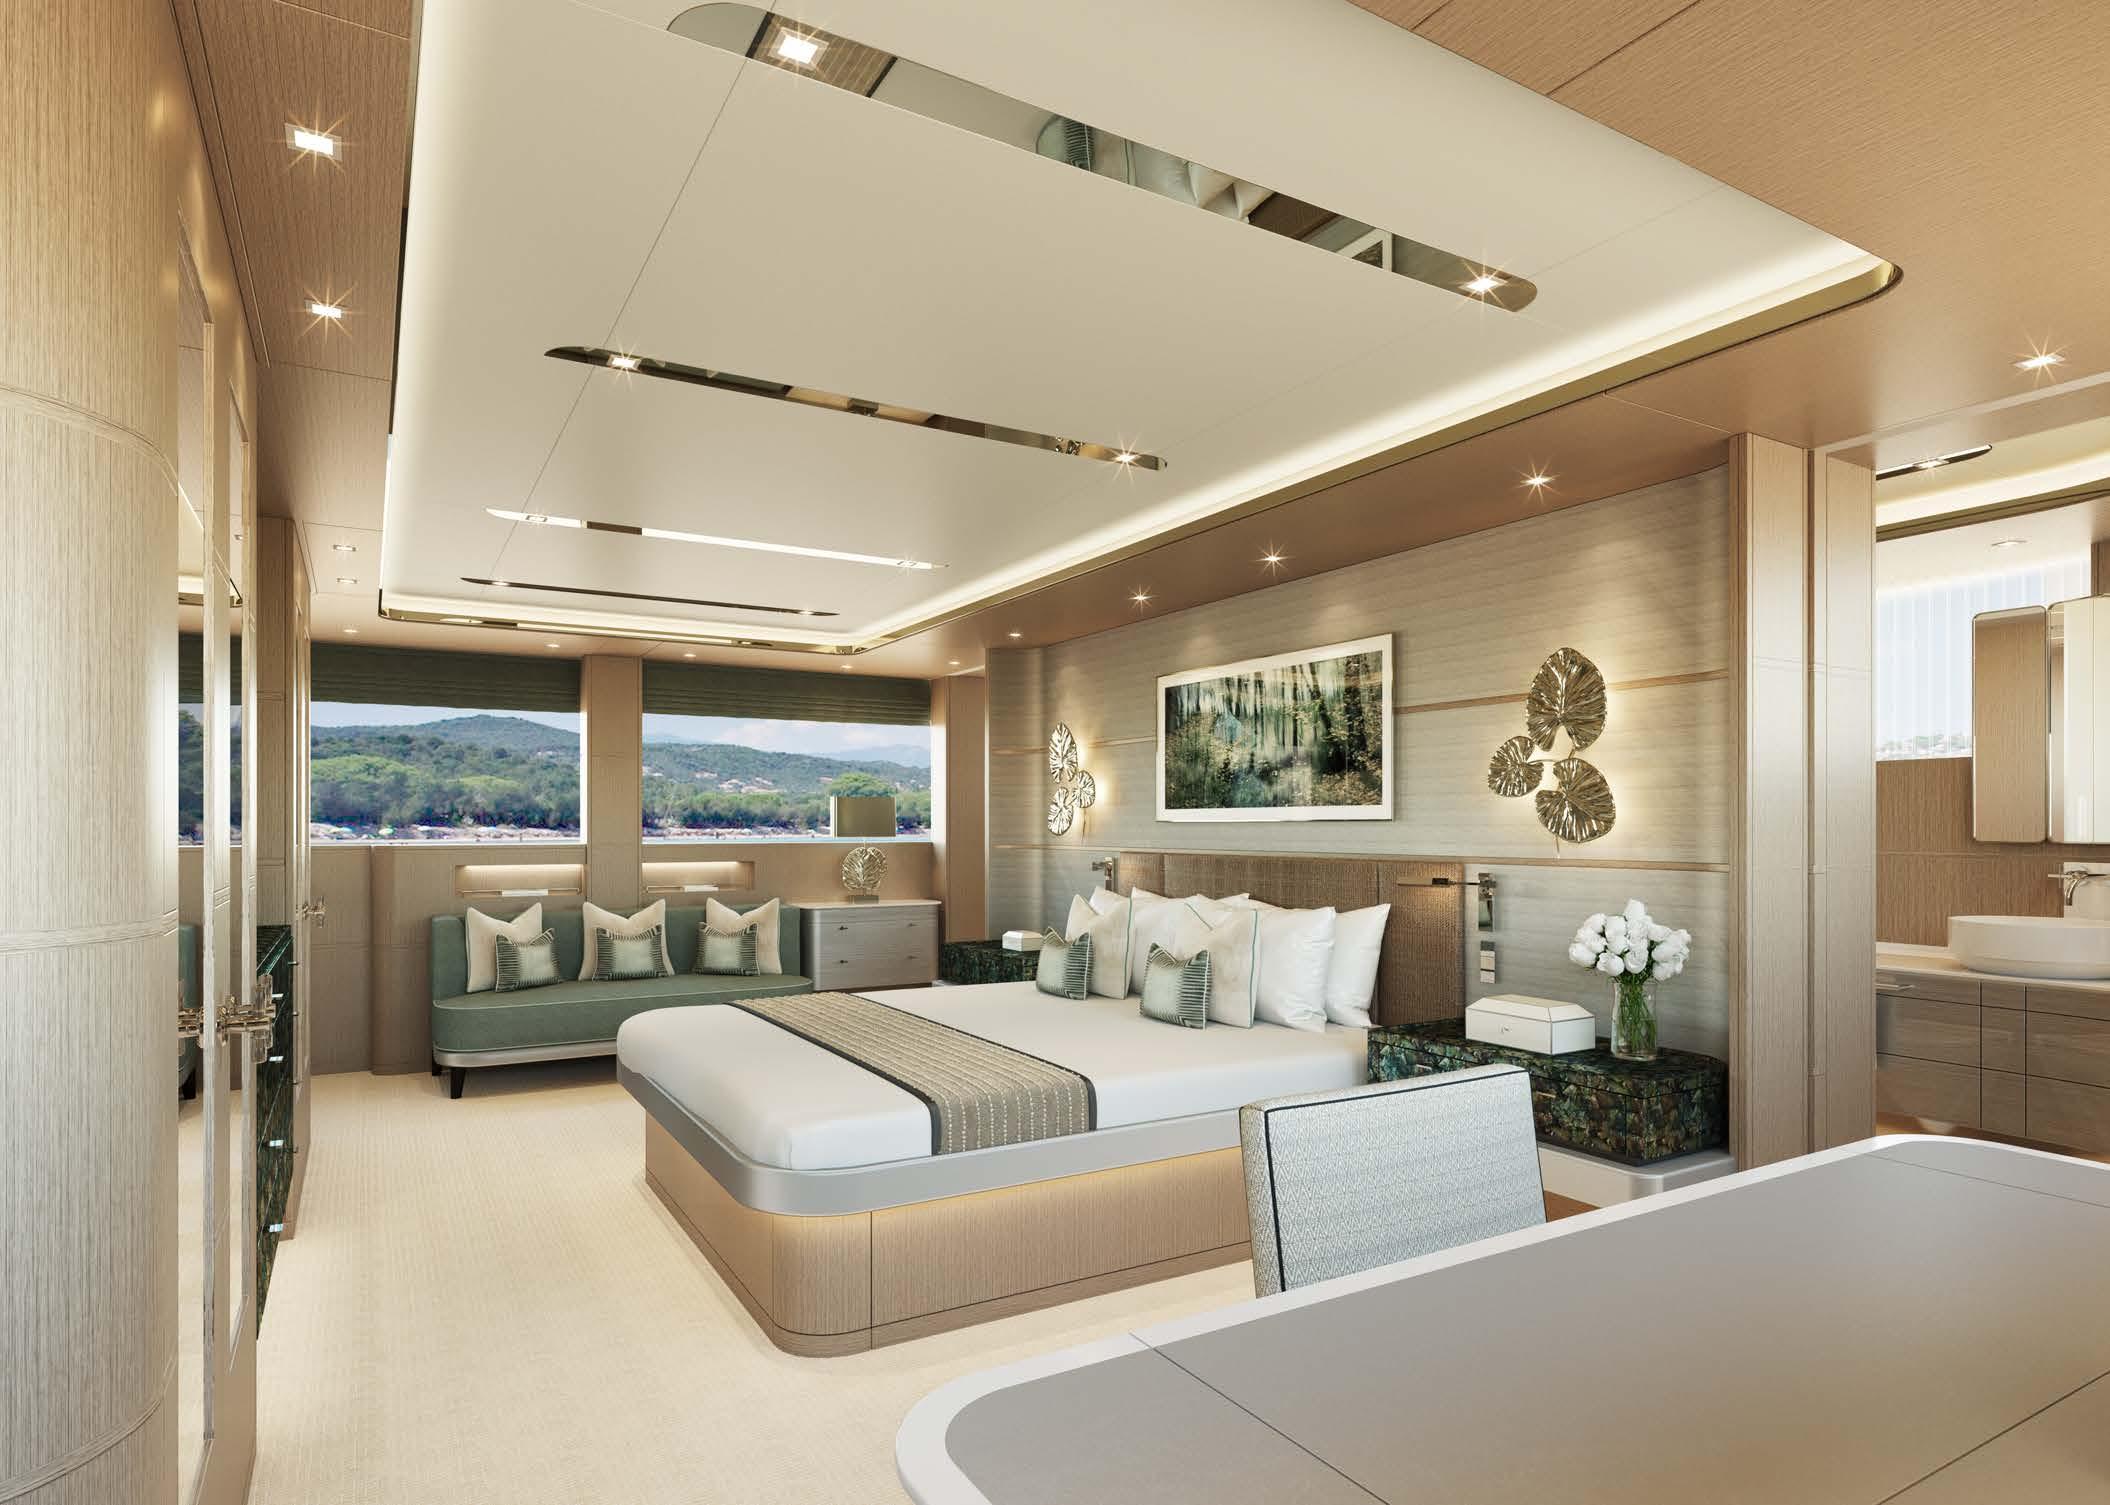 M/Y MOONEN Y201 yacht for sale master suite